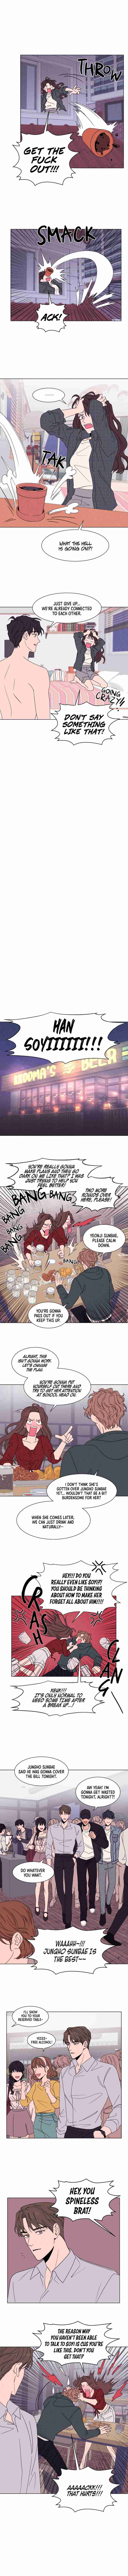 https://manga.mangadogs.com/comics/pic4/0/48384/3010839/eb5e7787874a212cada4f3ae7be441e6.jpg Page 3